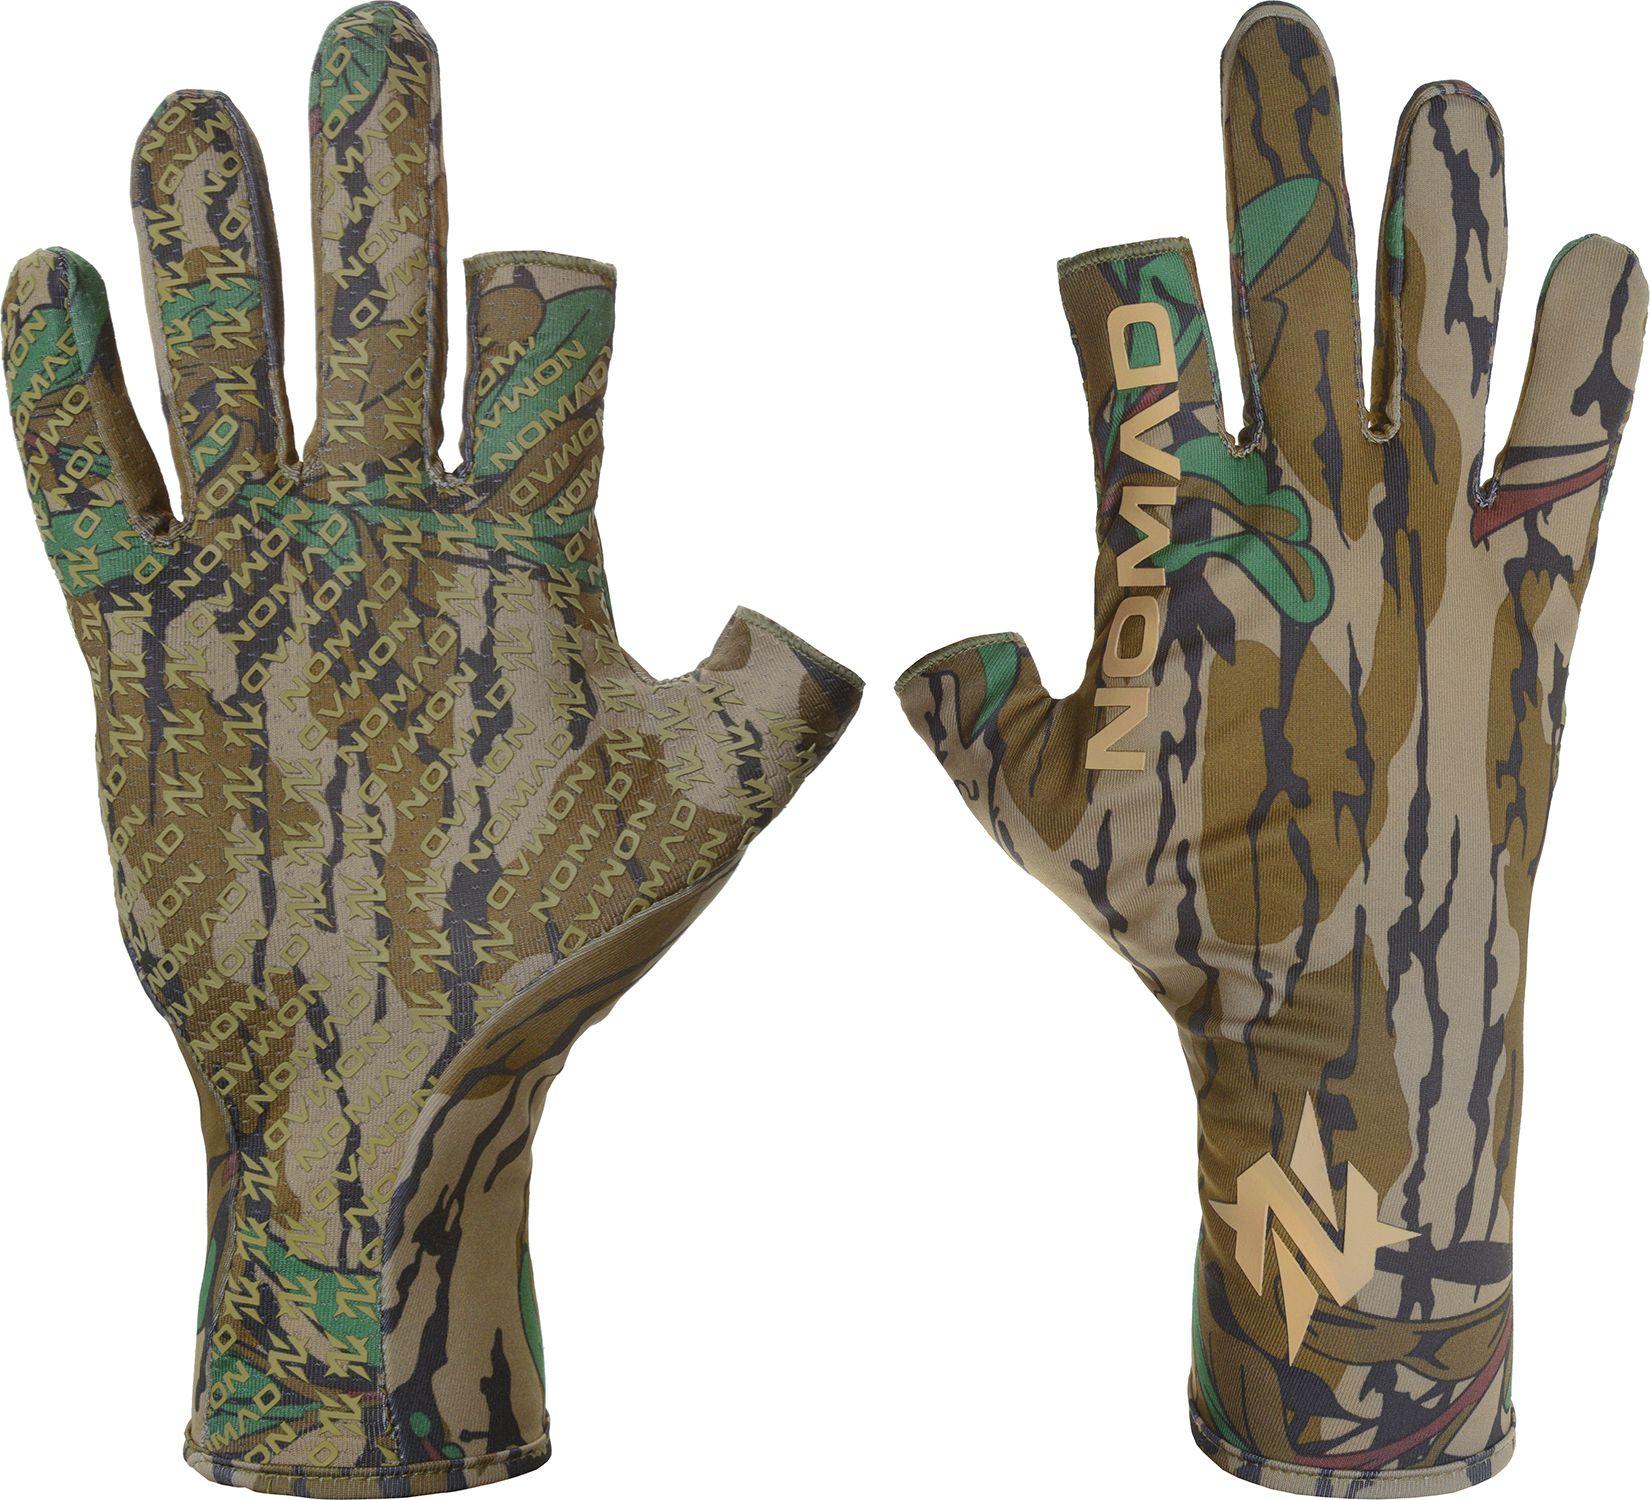 NOMAD Men's Fingerless Turkey Gloves, Size: ML, Mossy Oak Greenleaf thumbnail